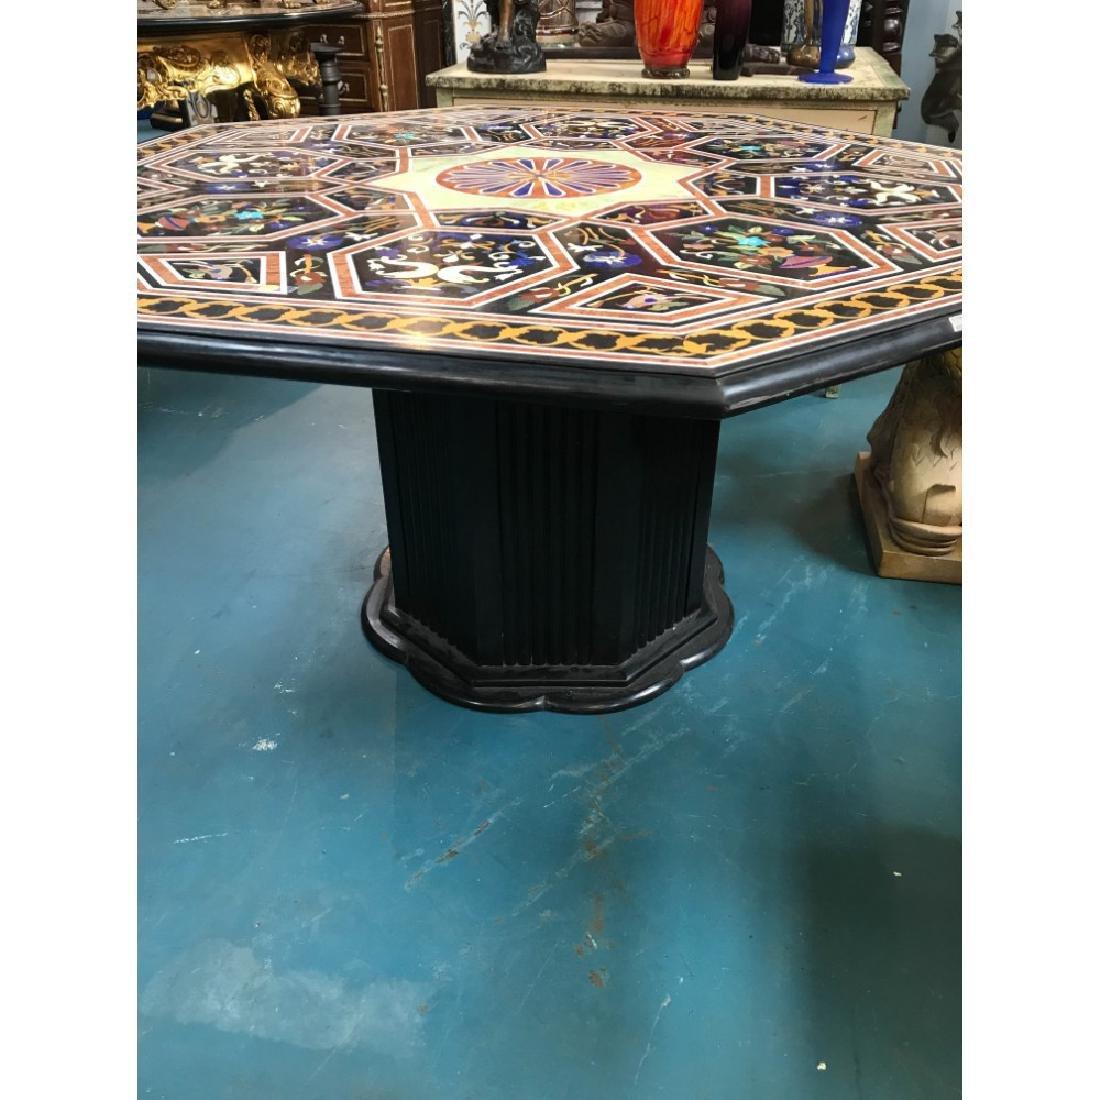 Mosaic Pietra Dura Octagon-Shaped Table - 9